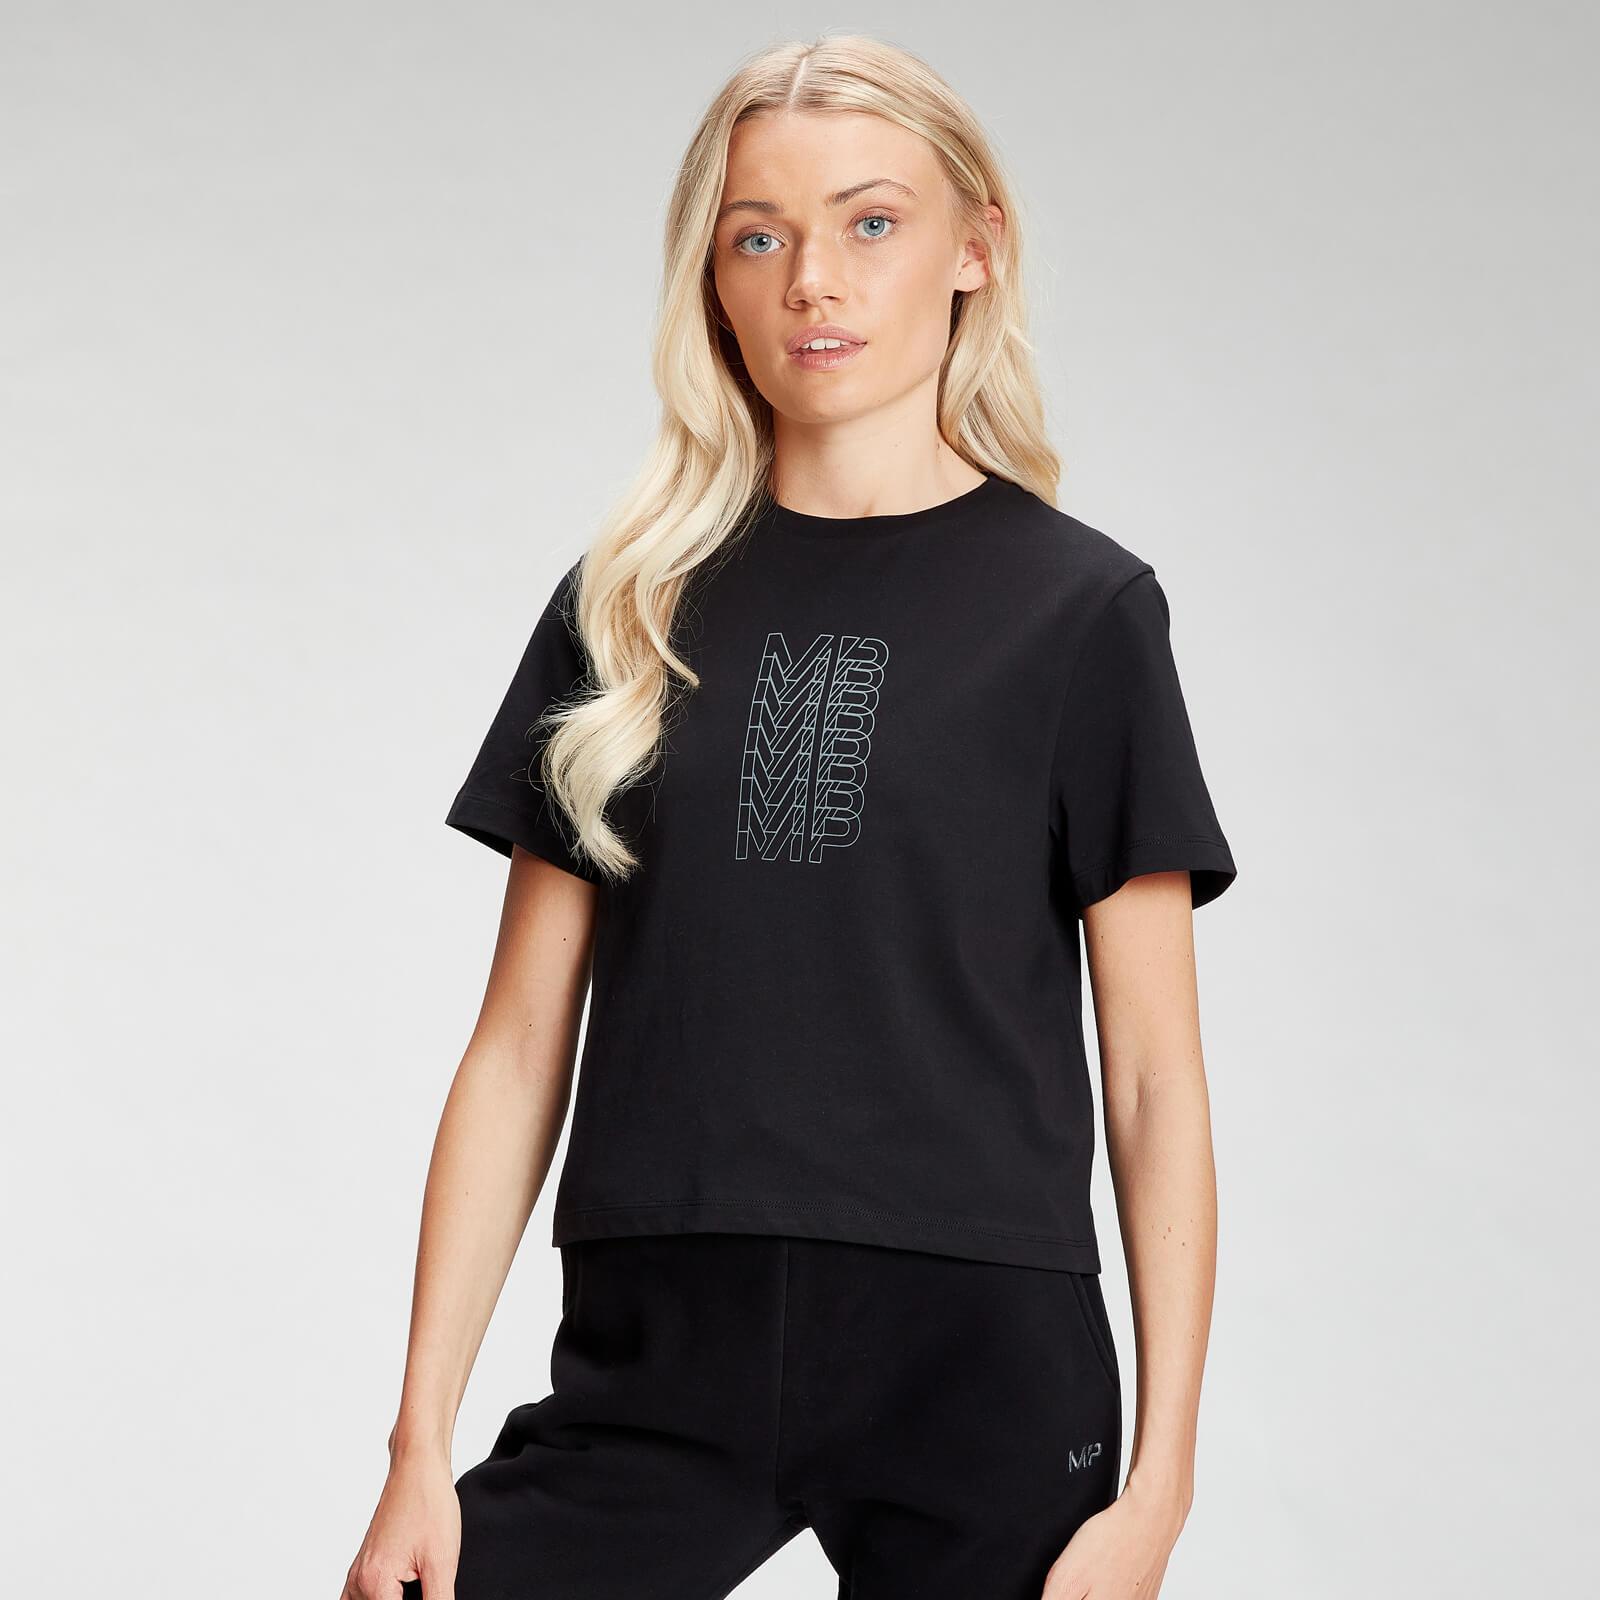 Купить MP Women's Repeat MP Crop T-Shirt - Black - XXL, Myprotein International